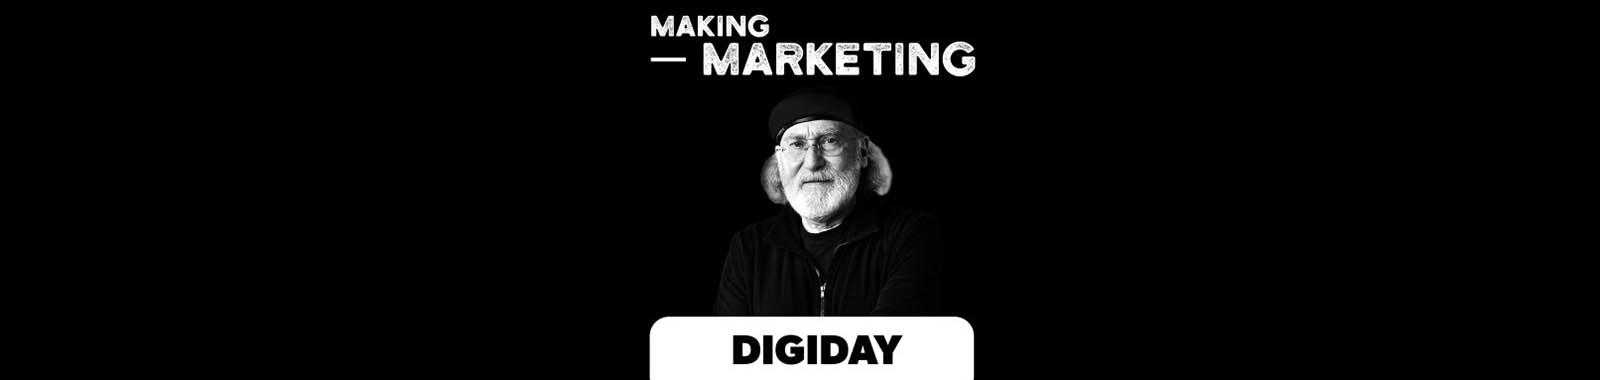 making_marketing_2596x1078_091318-eye